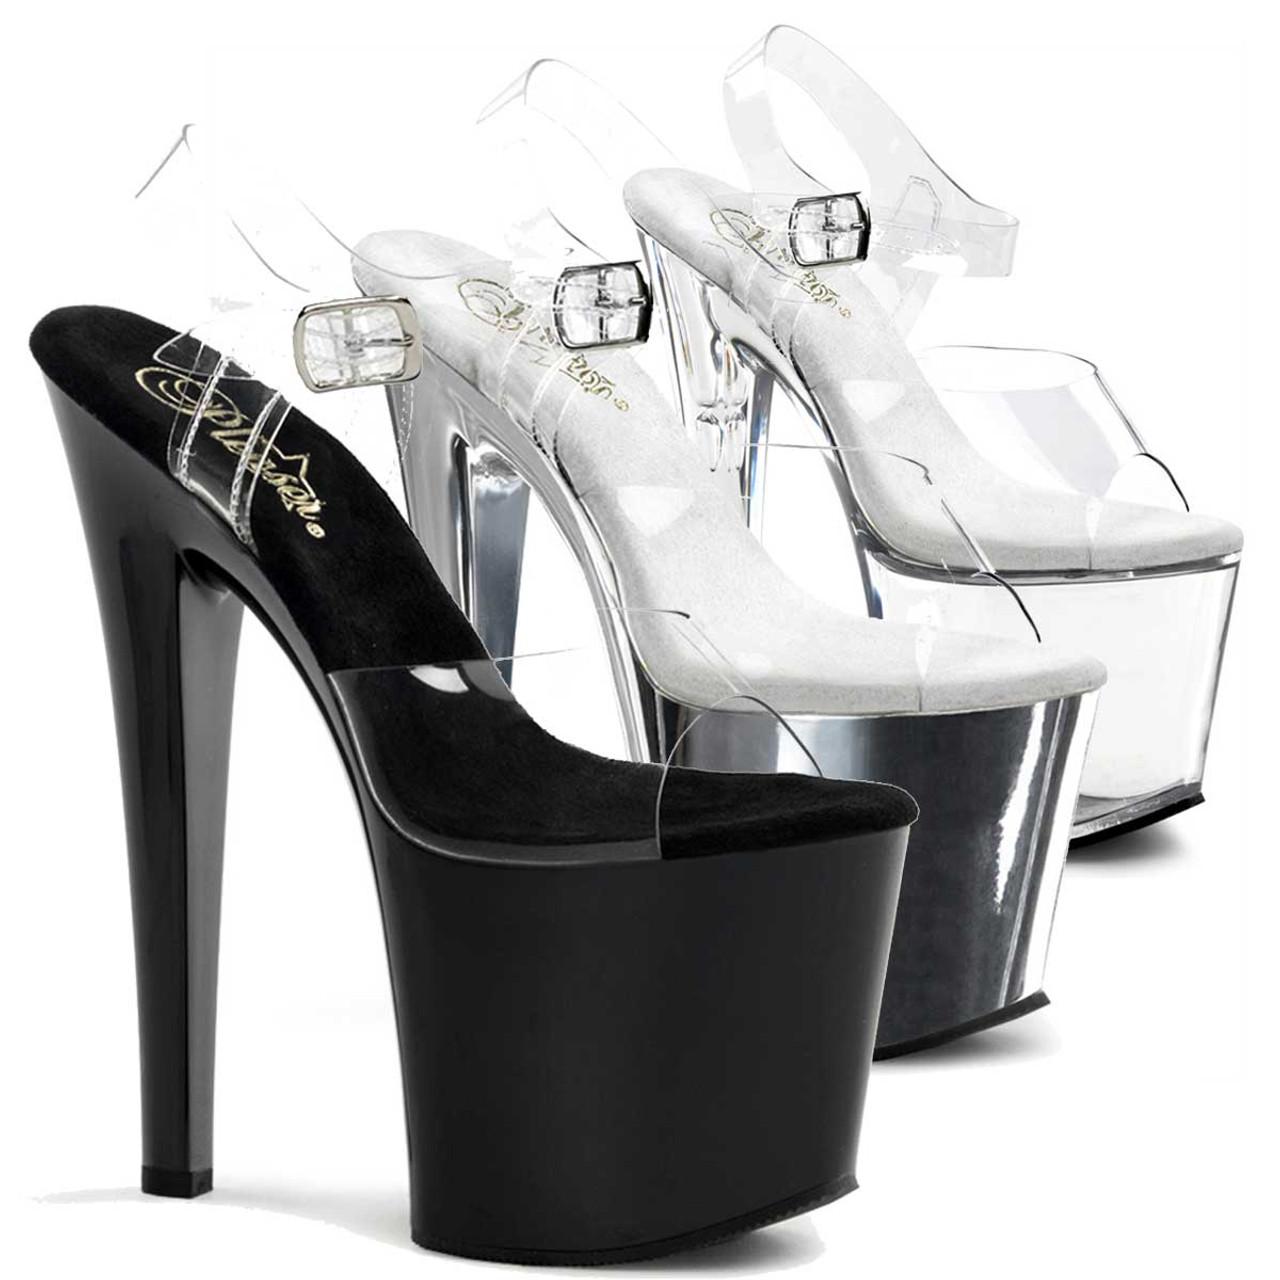 TABOO-708, 7.5 Inch Stripper Platform Shoes